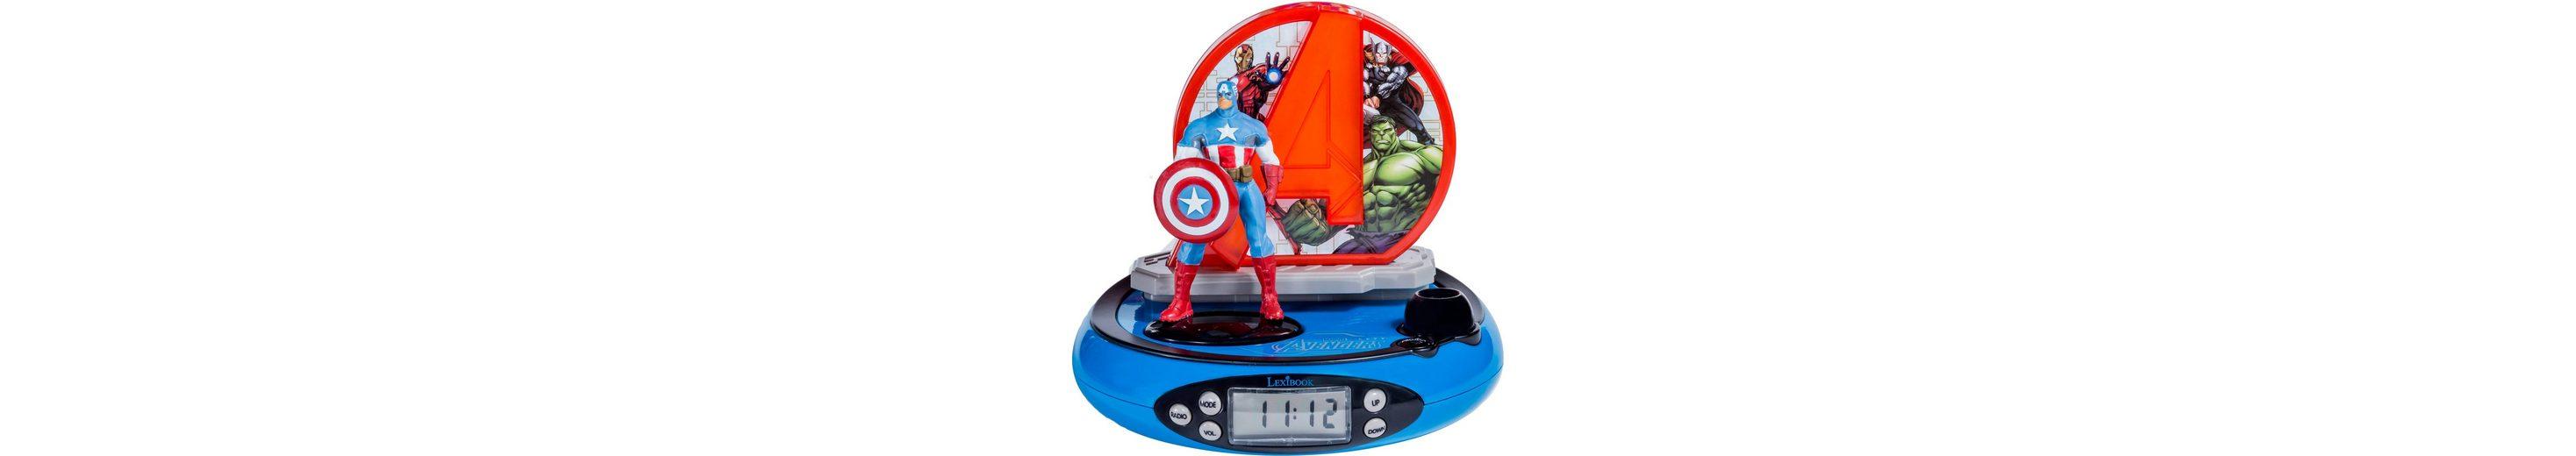 Lexibook Radiowecker mit Projektion, »Avengers Projektionswecker«